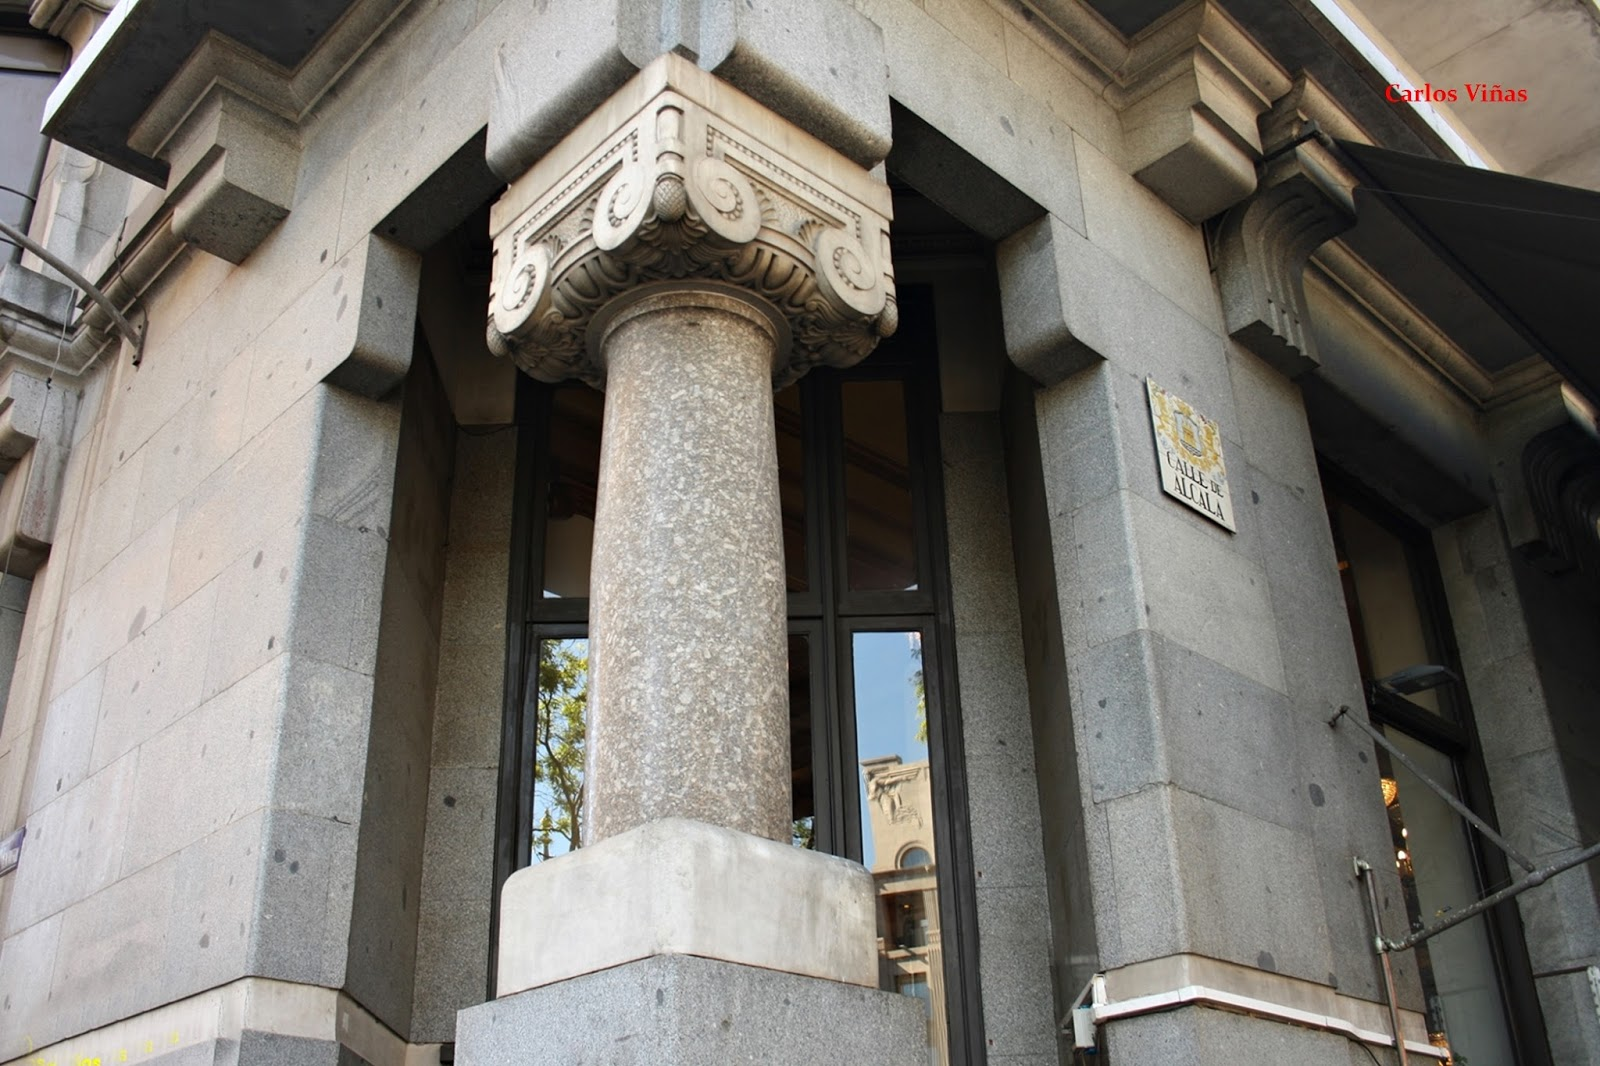 Soneto burlesco de federico garc a lorca dedicado al - Arquitectos lorca ...